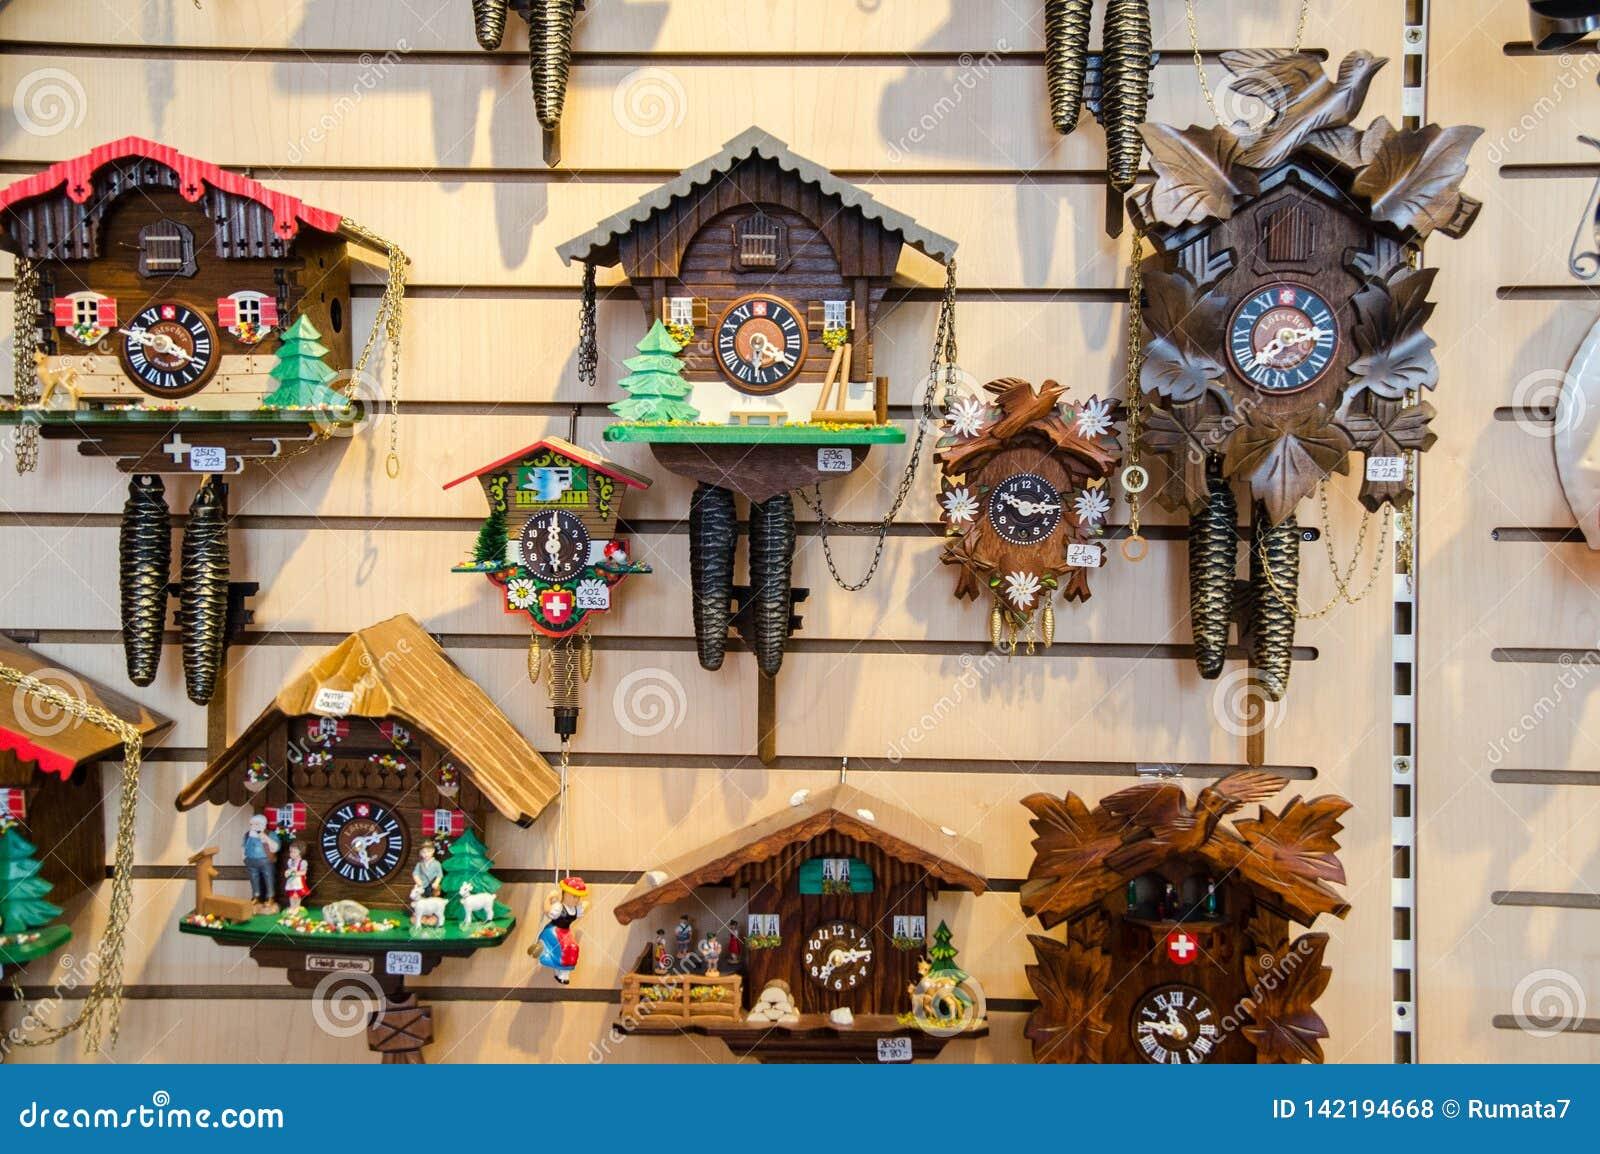 Magasin De Coucou Horloges Au Village De Grindelwald Switzerland Photo Stock Image Du Magasin Switzerland 142194668